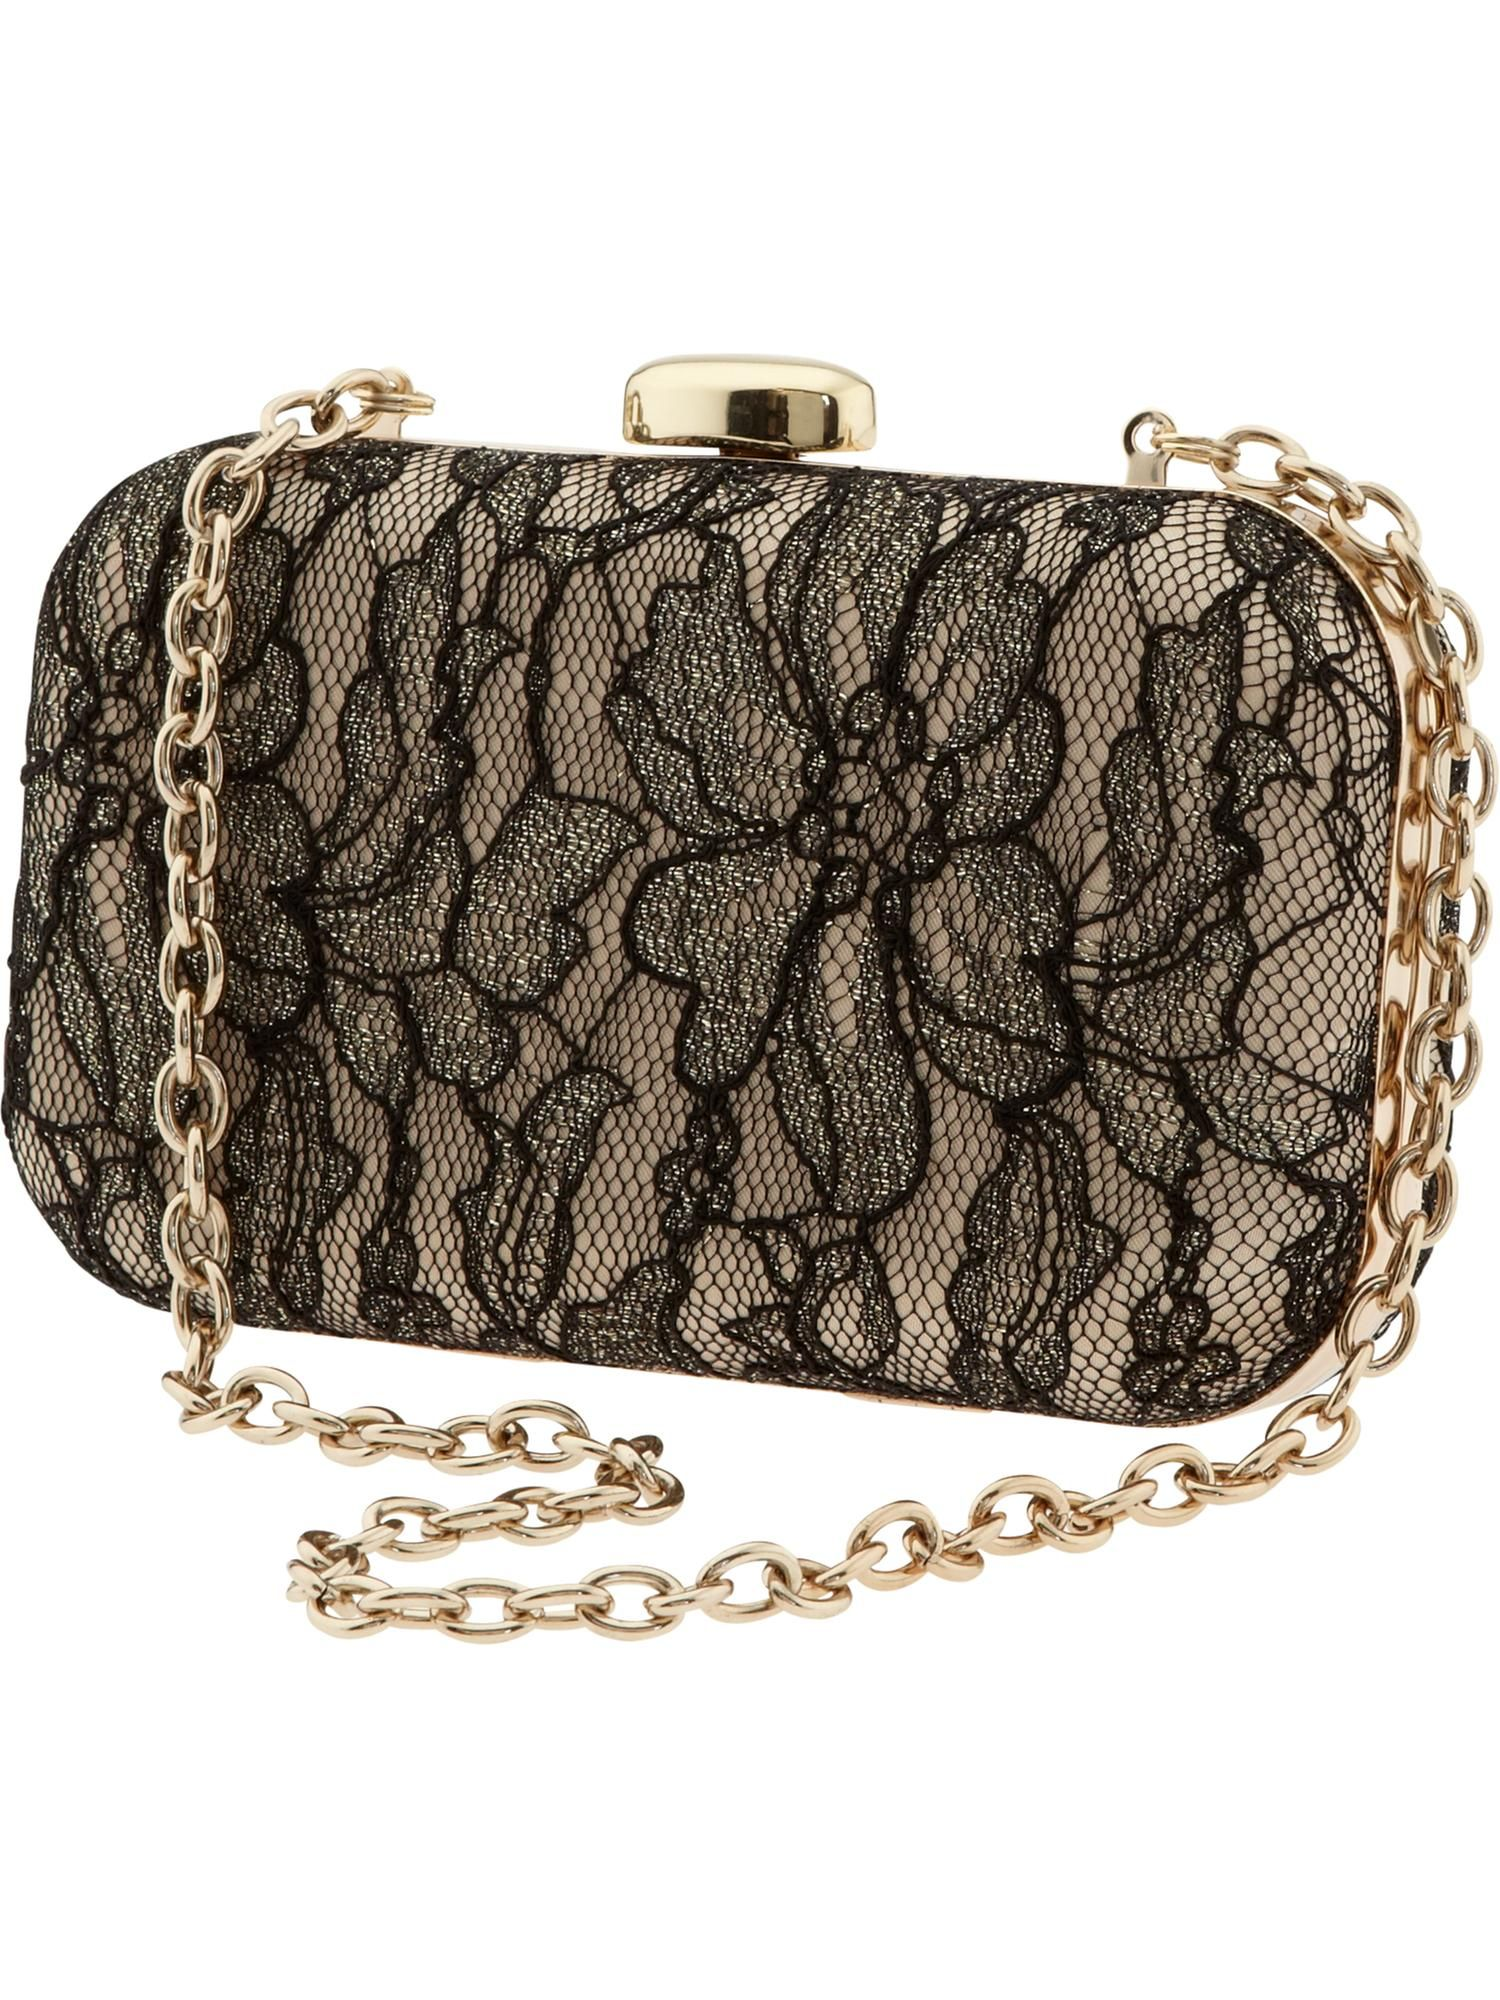 #BRAnnaK #BananaRepublic | Scarlett box clutch. I adore the lace!